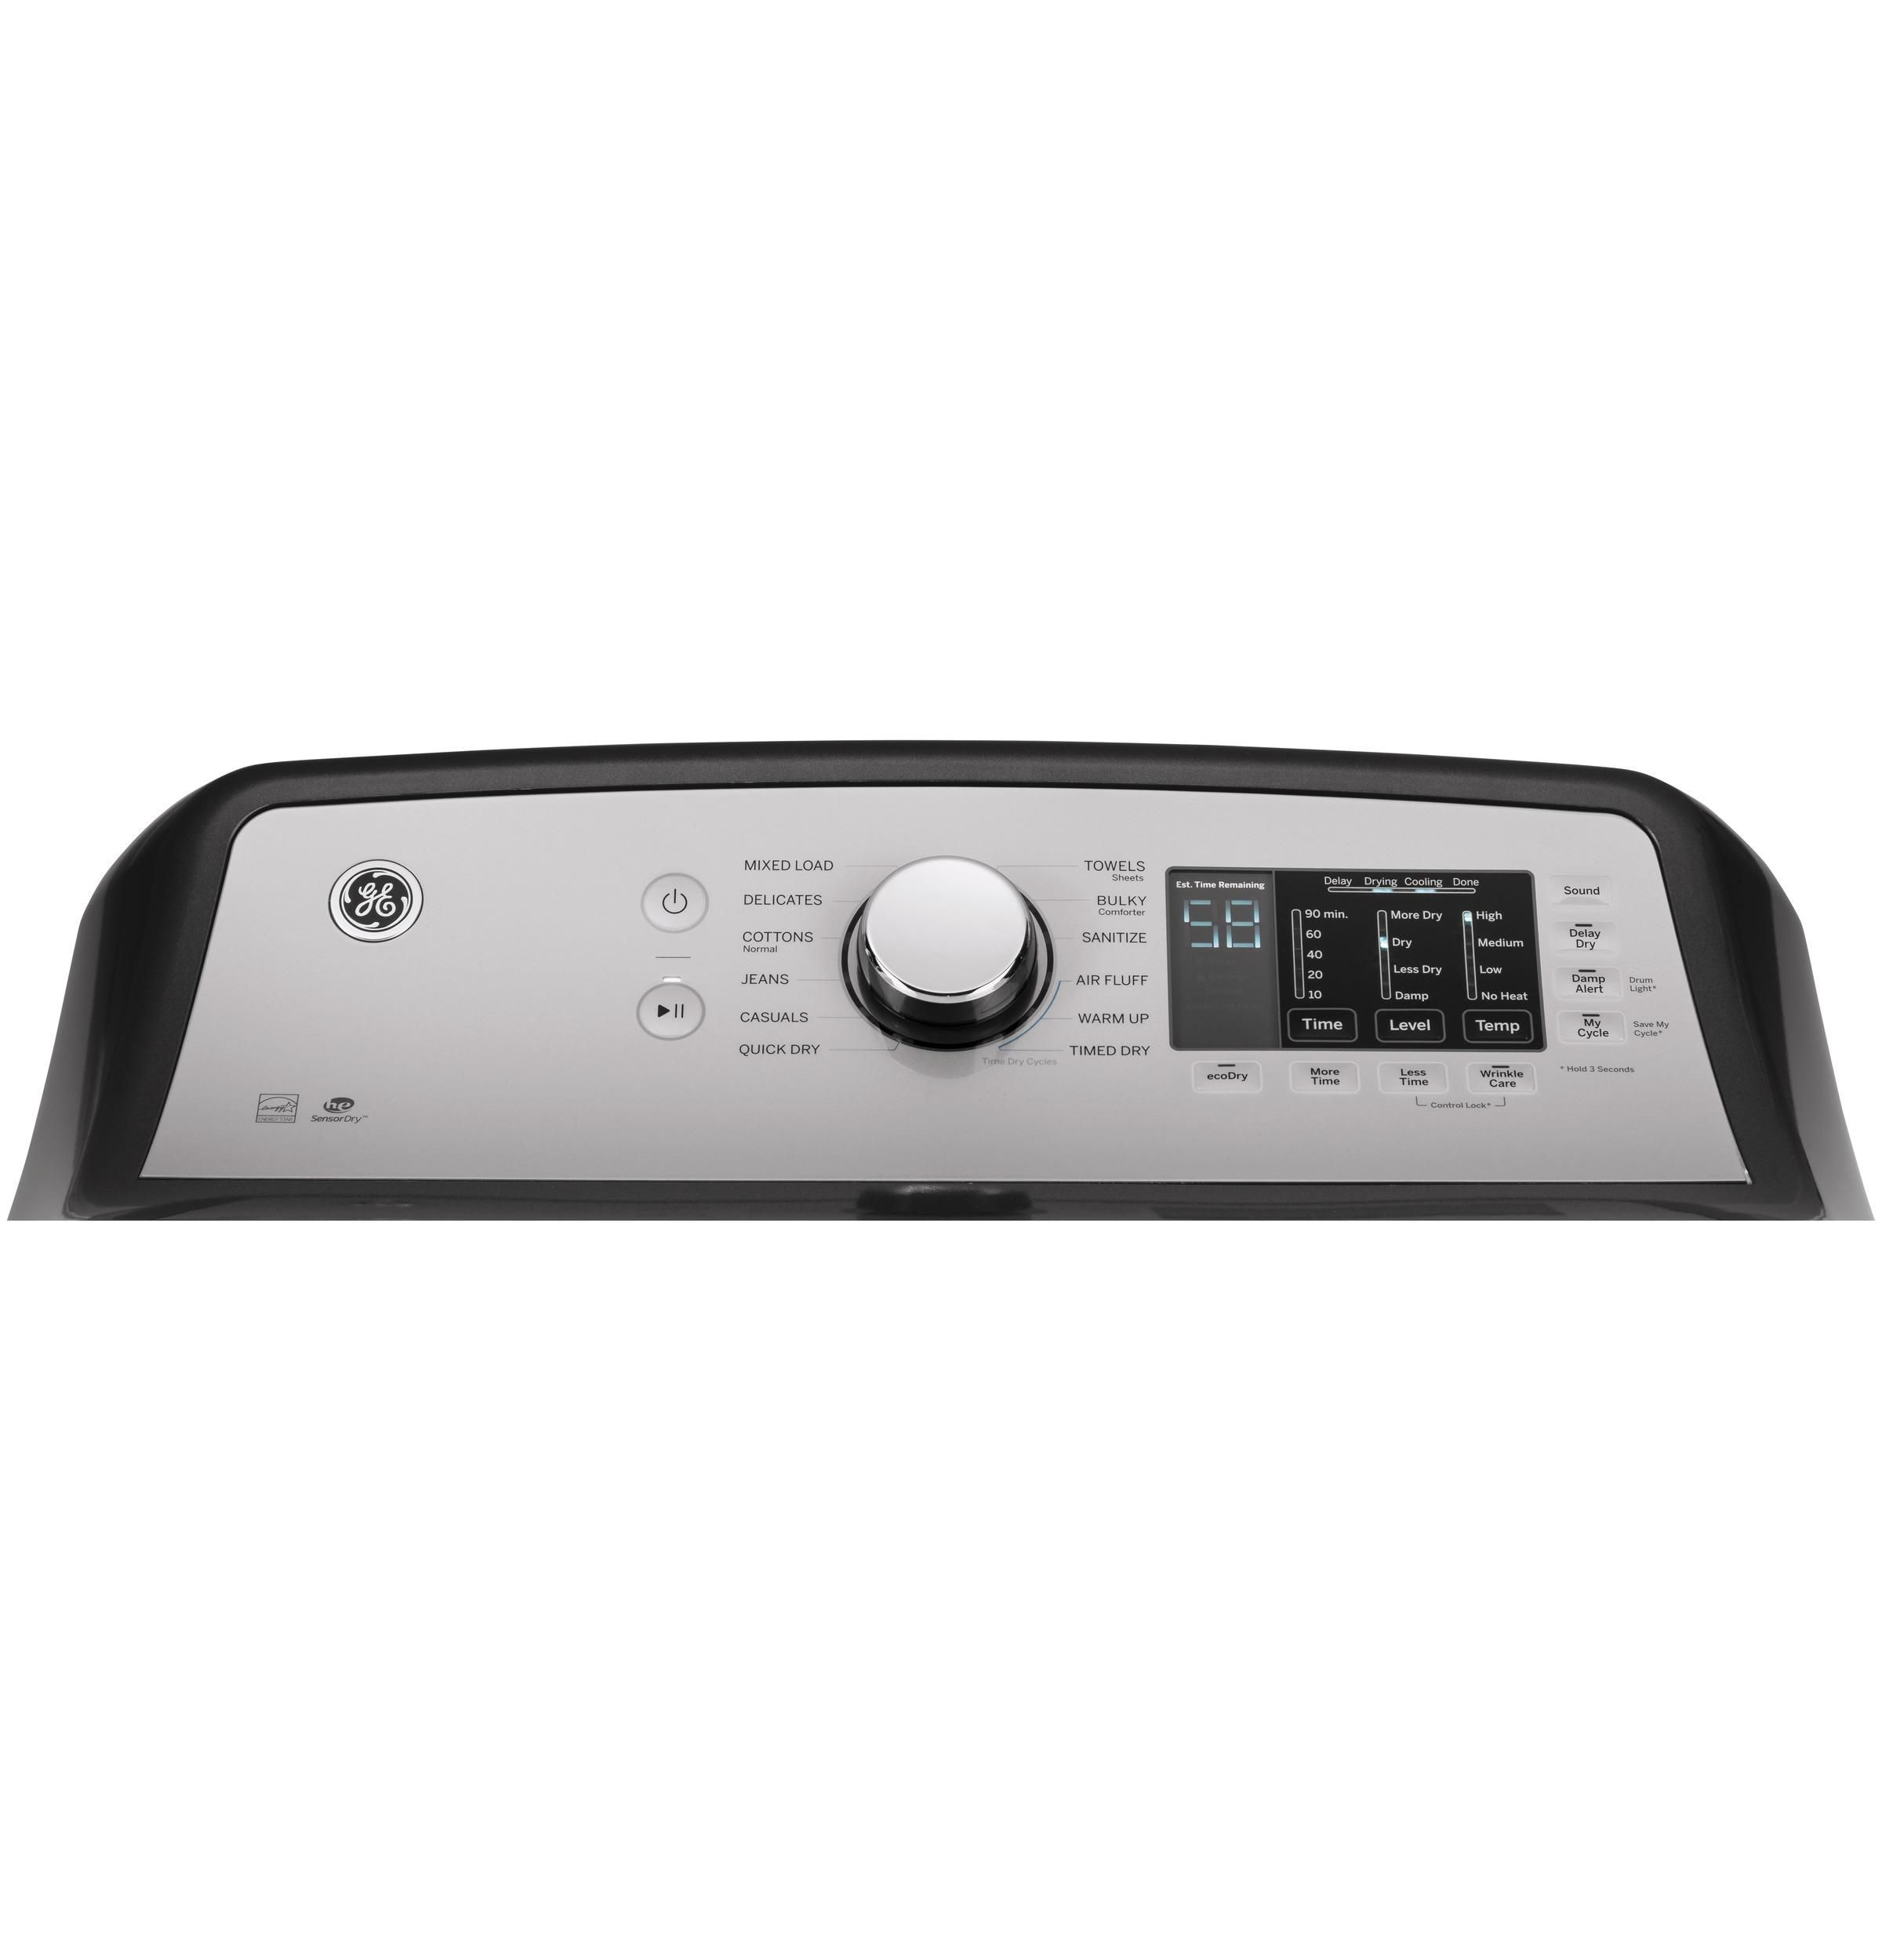 Ge Gas Dryer With He Sensor Dry 7 4 Cu Ft Diamond Gray Gas Dryer Dryer